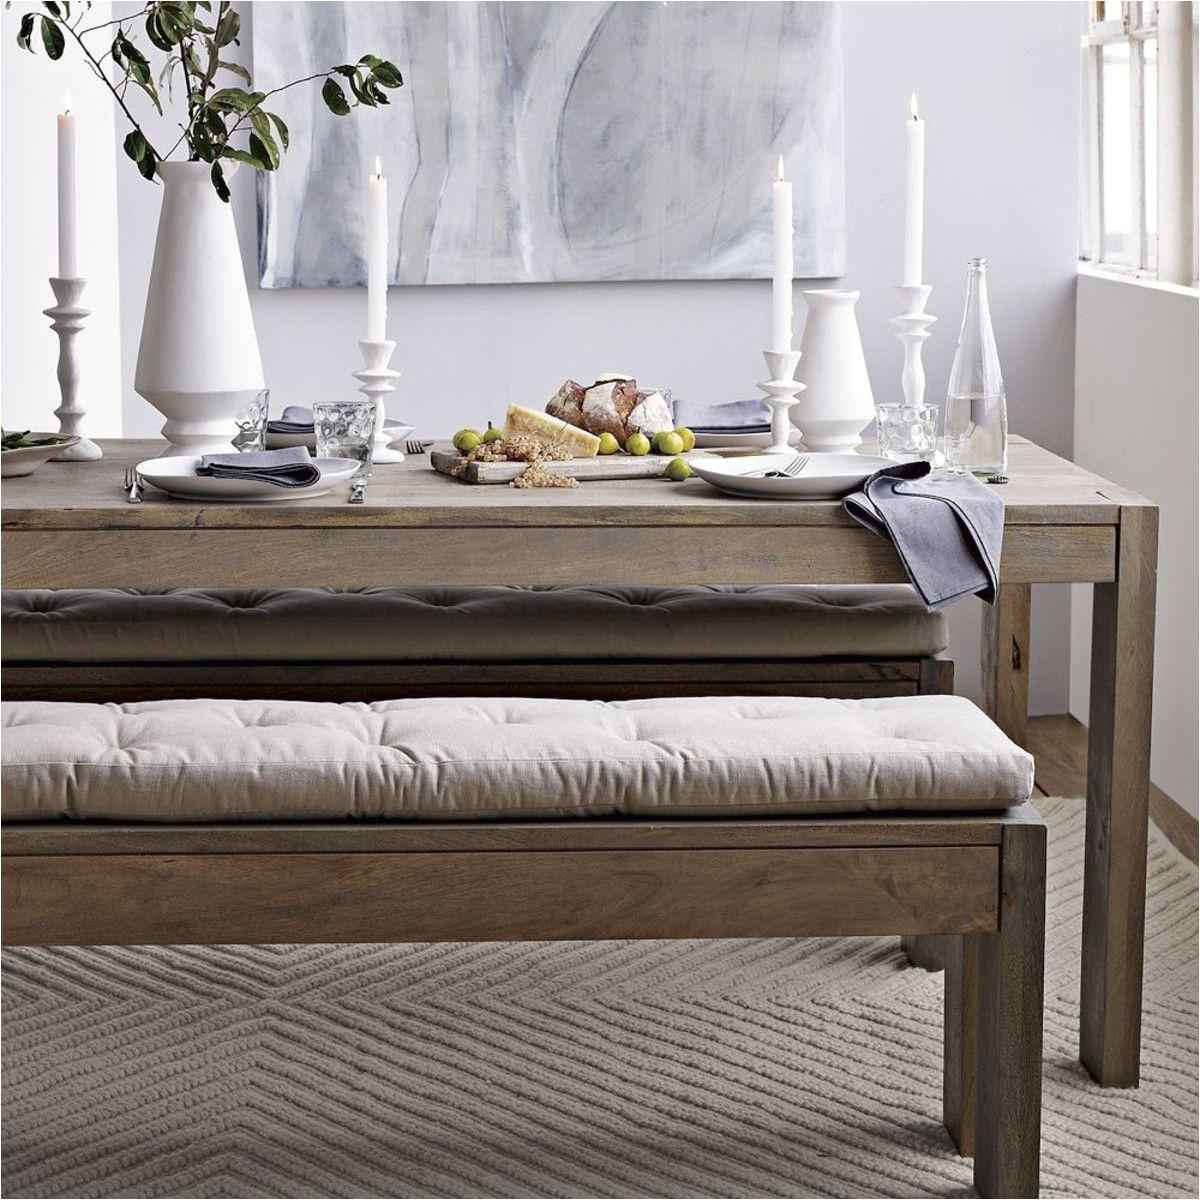 kitchen bench cushions and flower designer ideas